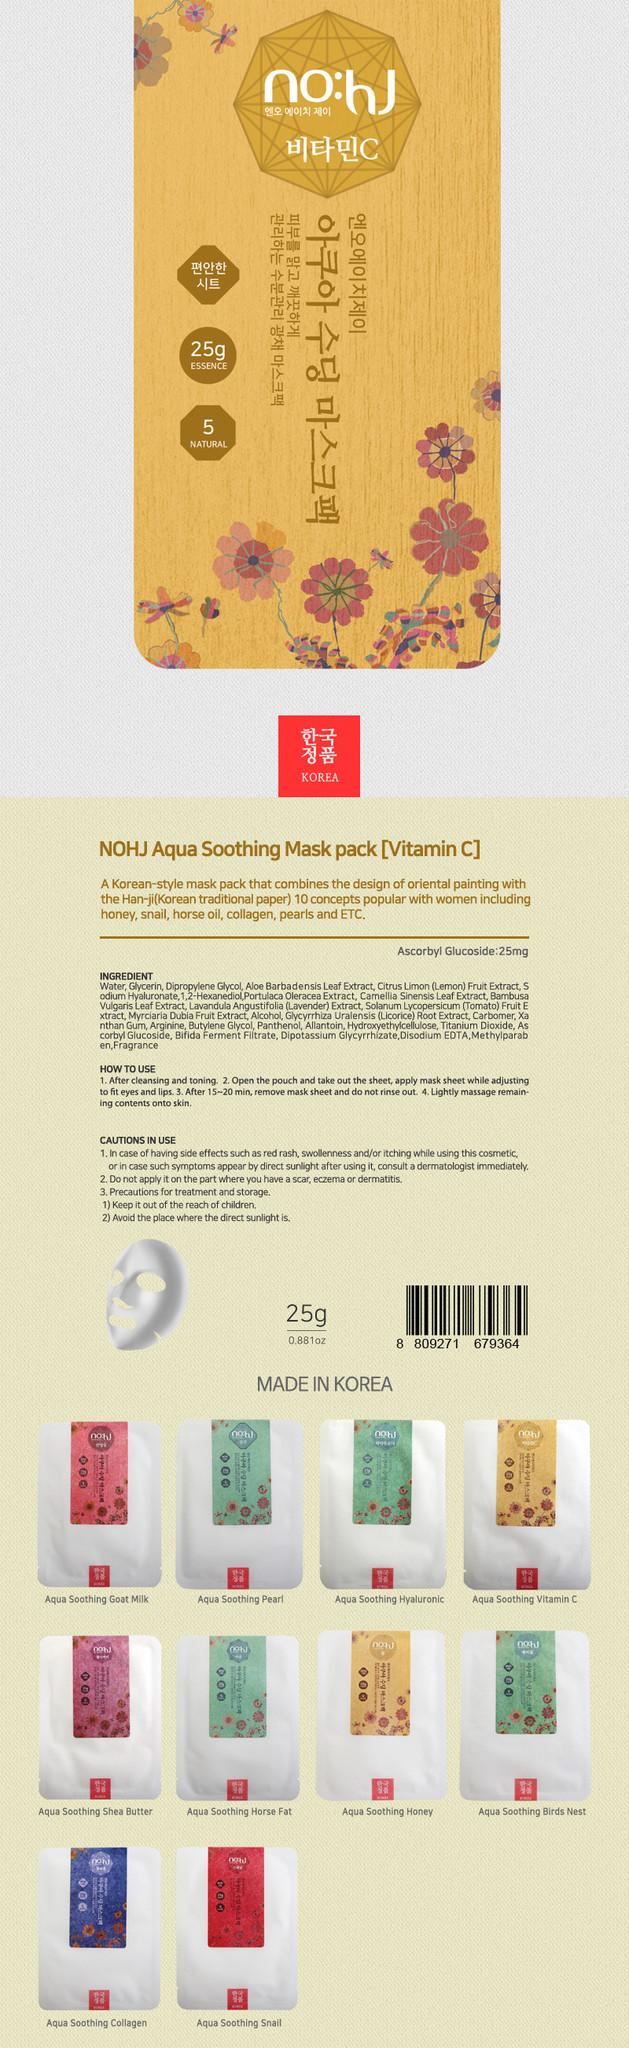 Aqua Soothing Mask pack [Vitamin C]-2